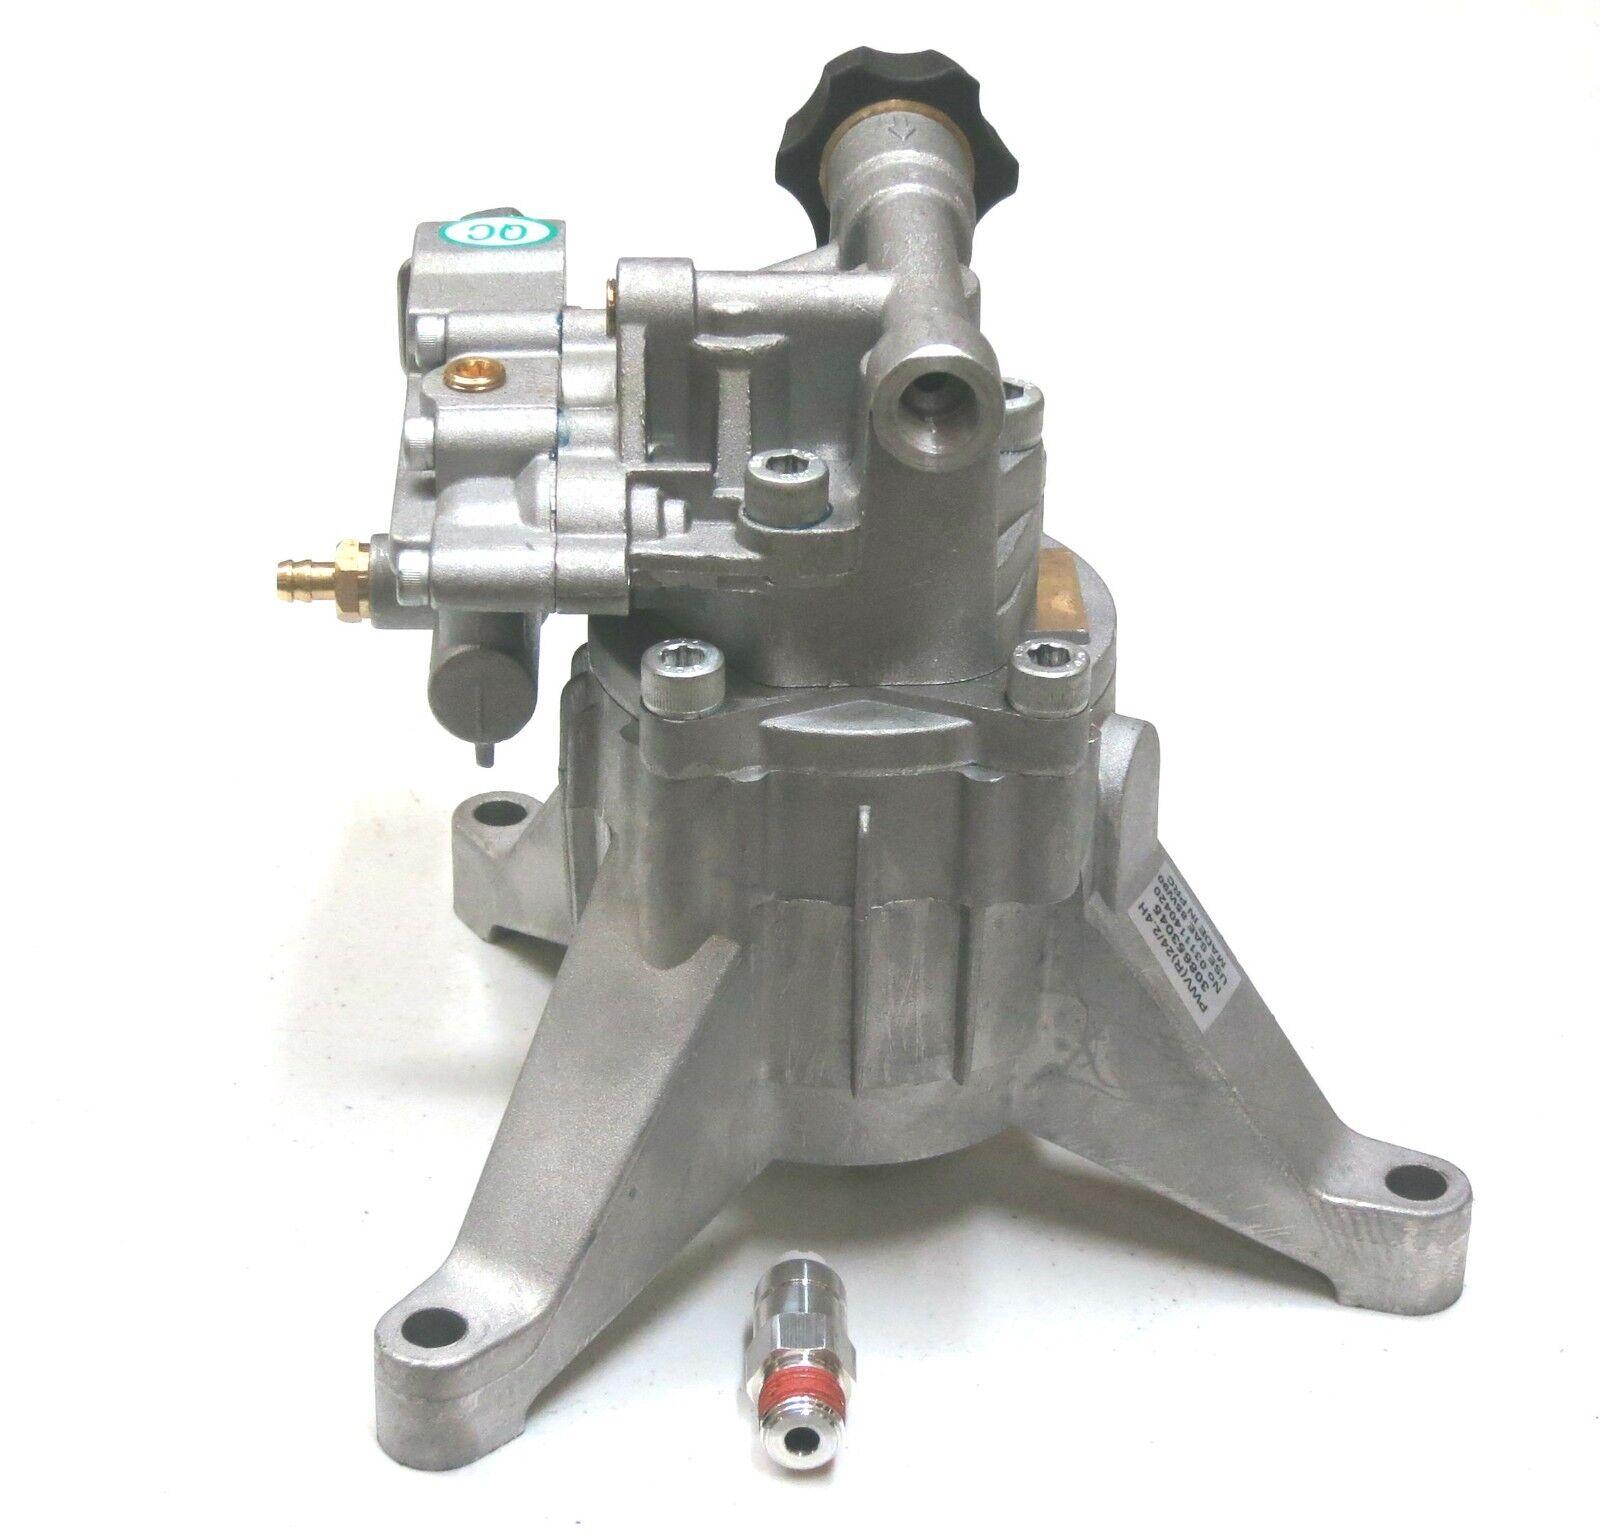 troy bilt pressure washer parts diagram 2005 kia sedona wiring new 2800 psi power water pump